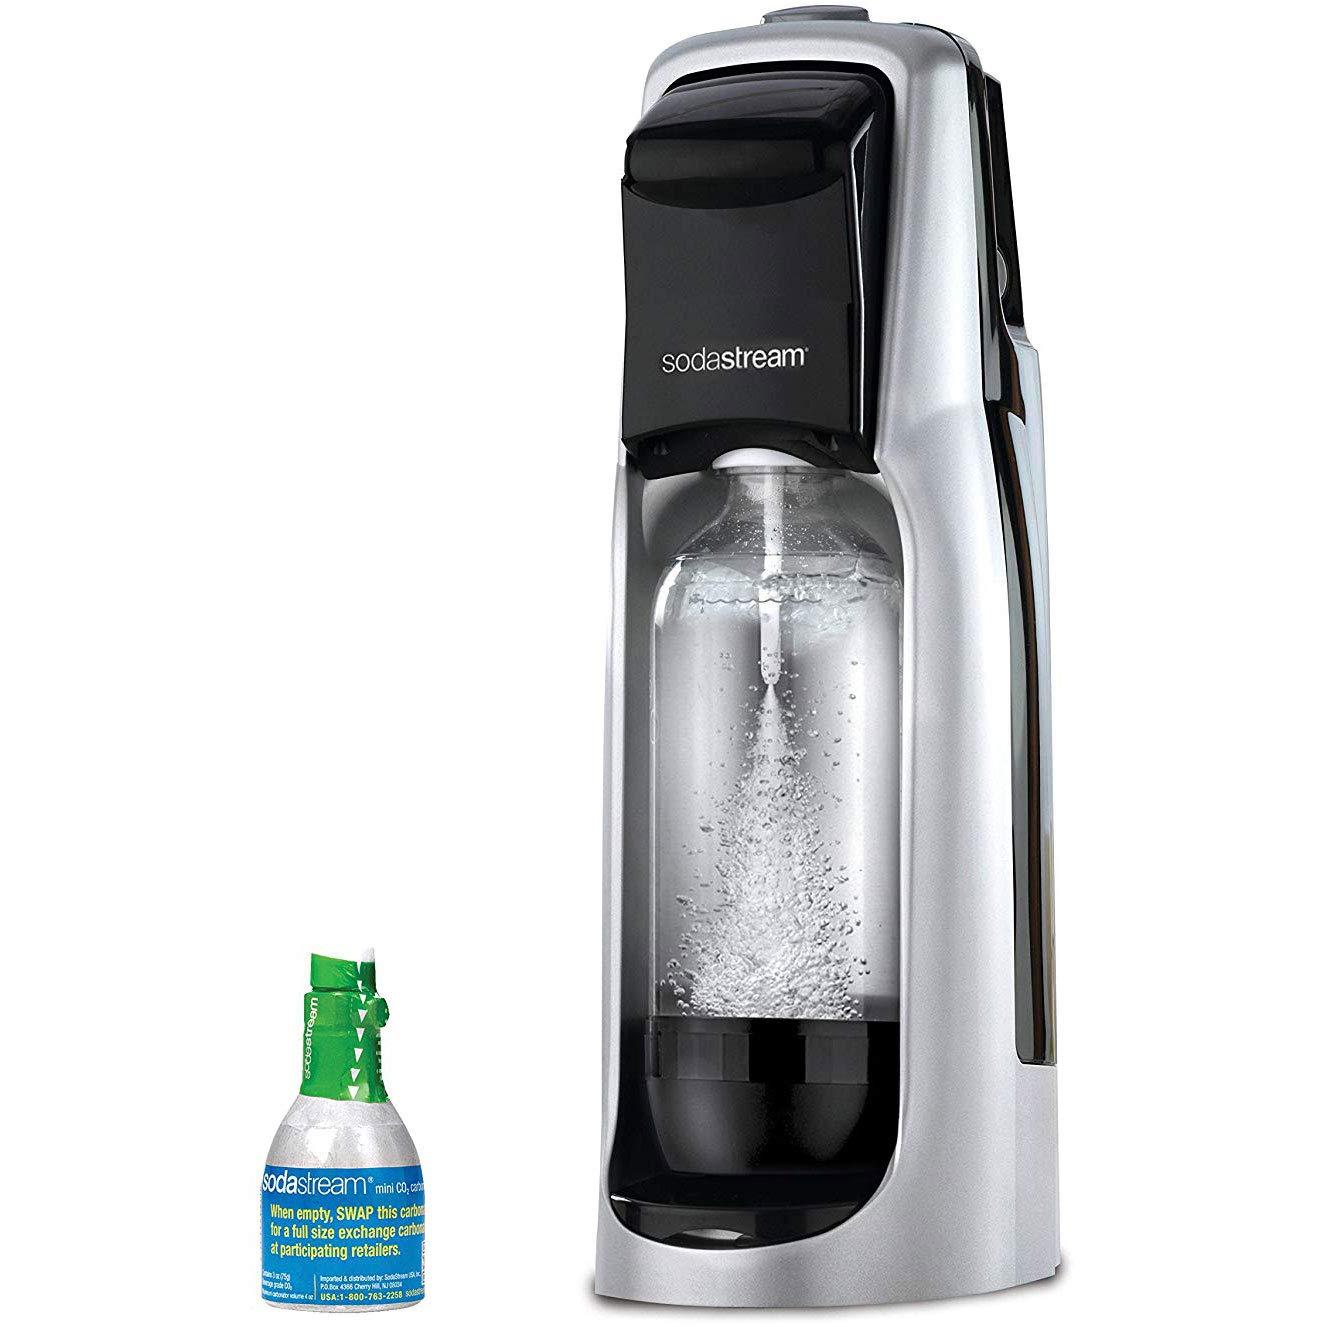 373849e8954 Amazon.com: SodaStream Jet Sparkling Water Maker Starter Kit, Black and  Silver: Kitchen & Dining